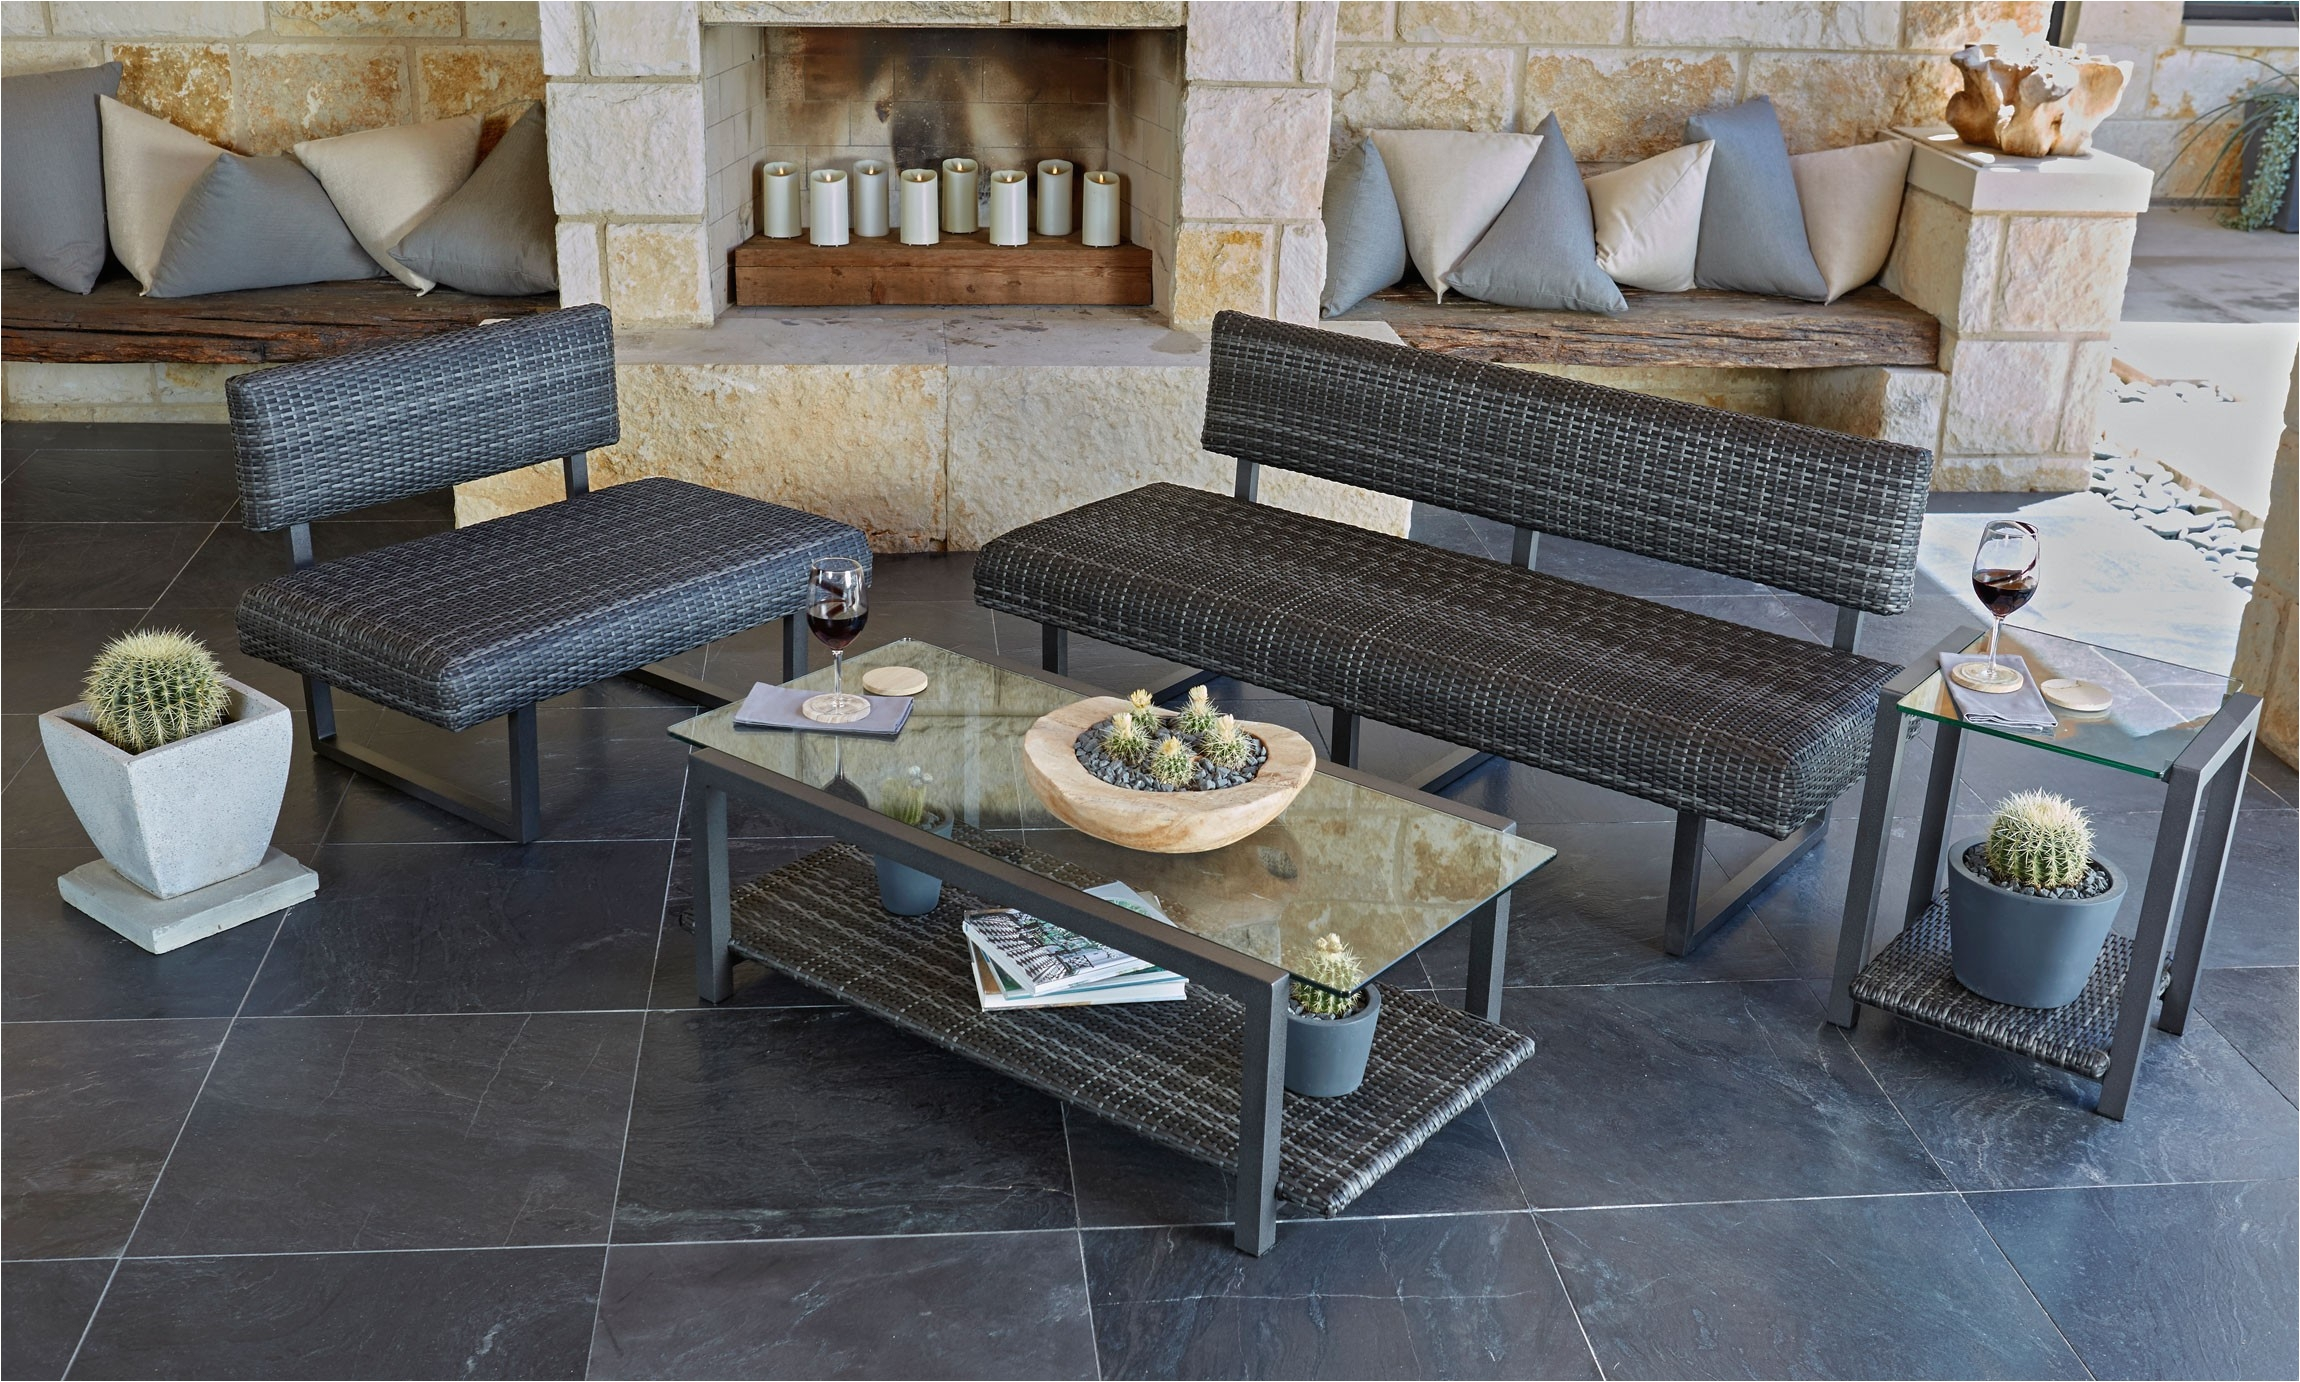 d83a8591a2b29a42b7cecfde347bd303 best choice of woodard outdoor furniture model gallery image regarding recent des moines patio furniture des